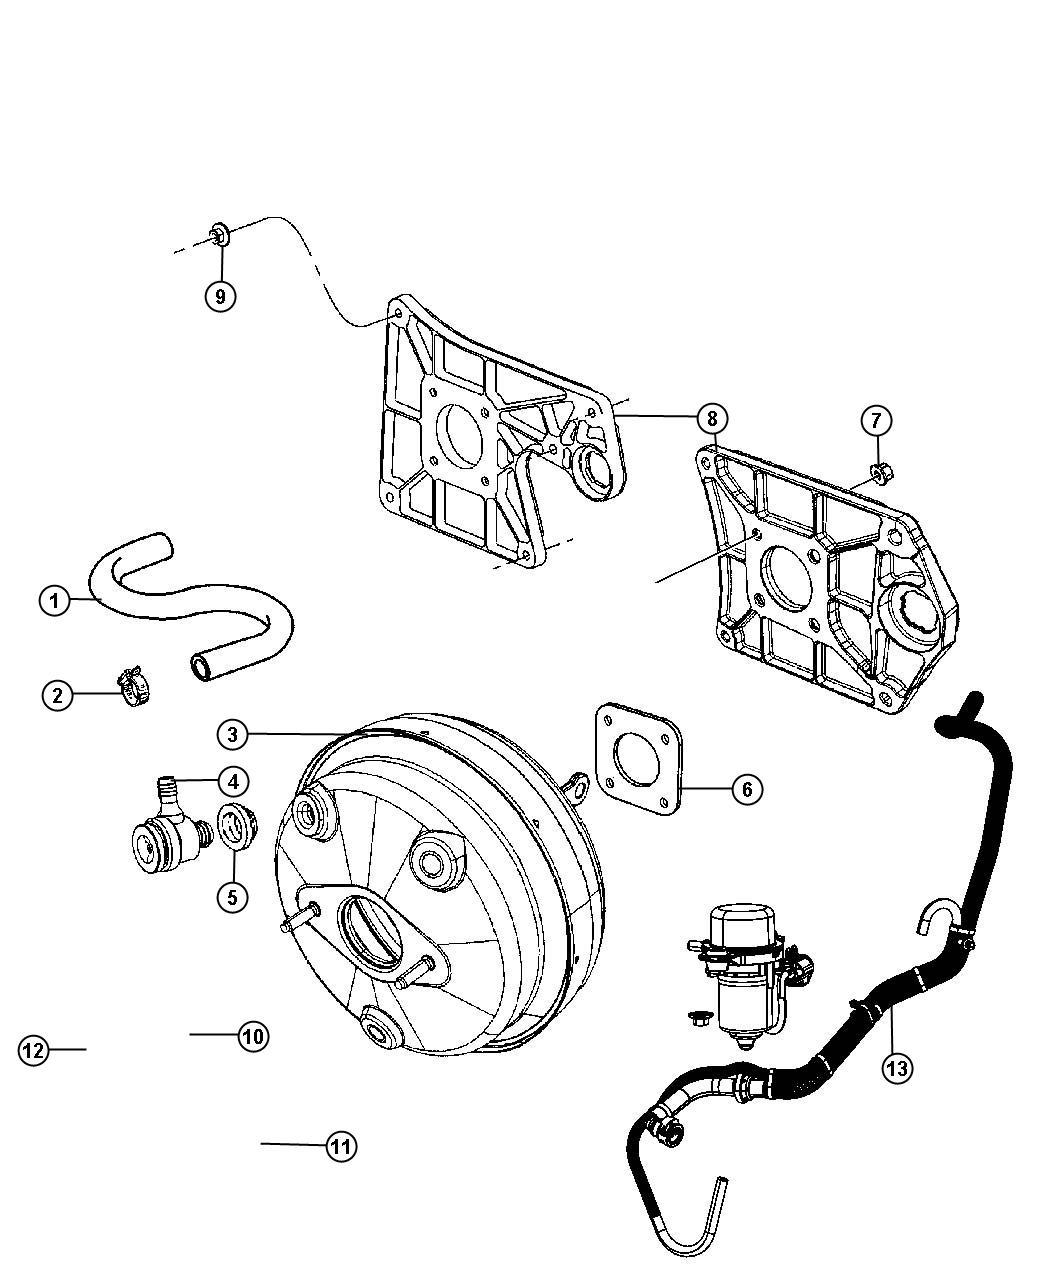 Jeep Wrangler Pump Air 3 6l V6 24v Vvt Engine